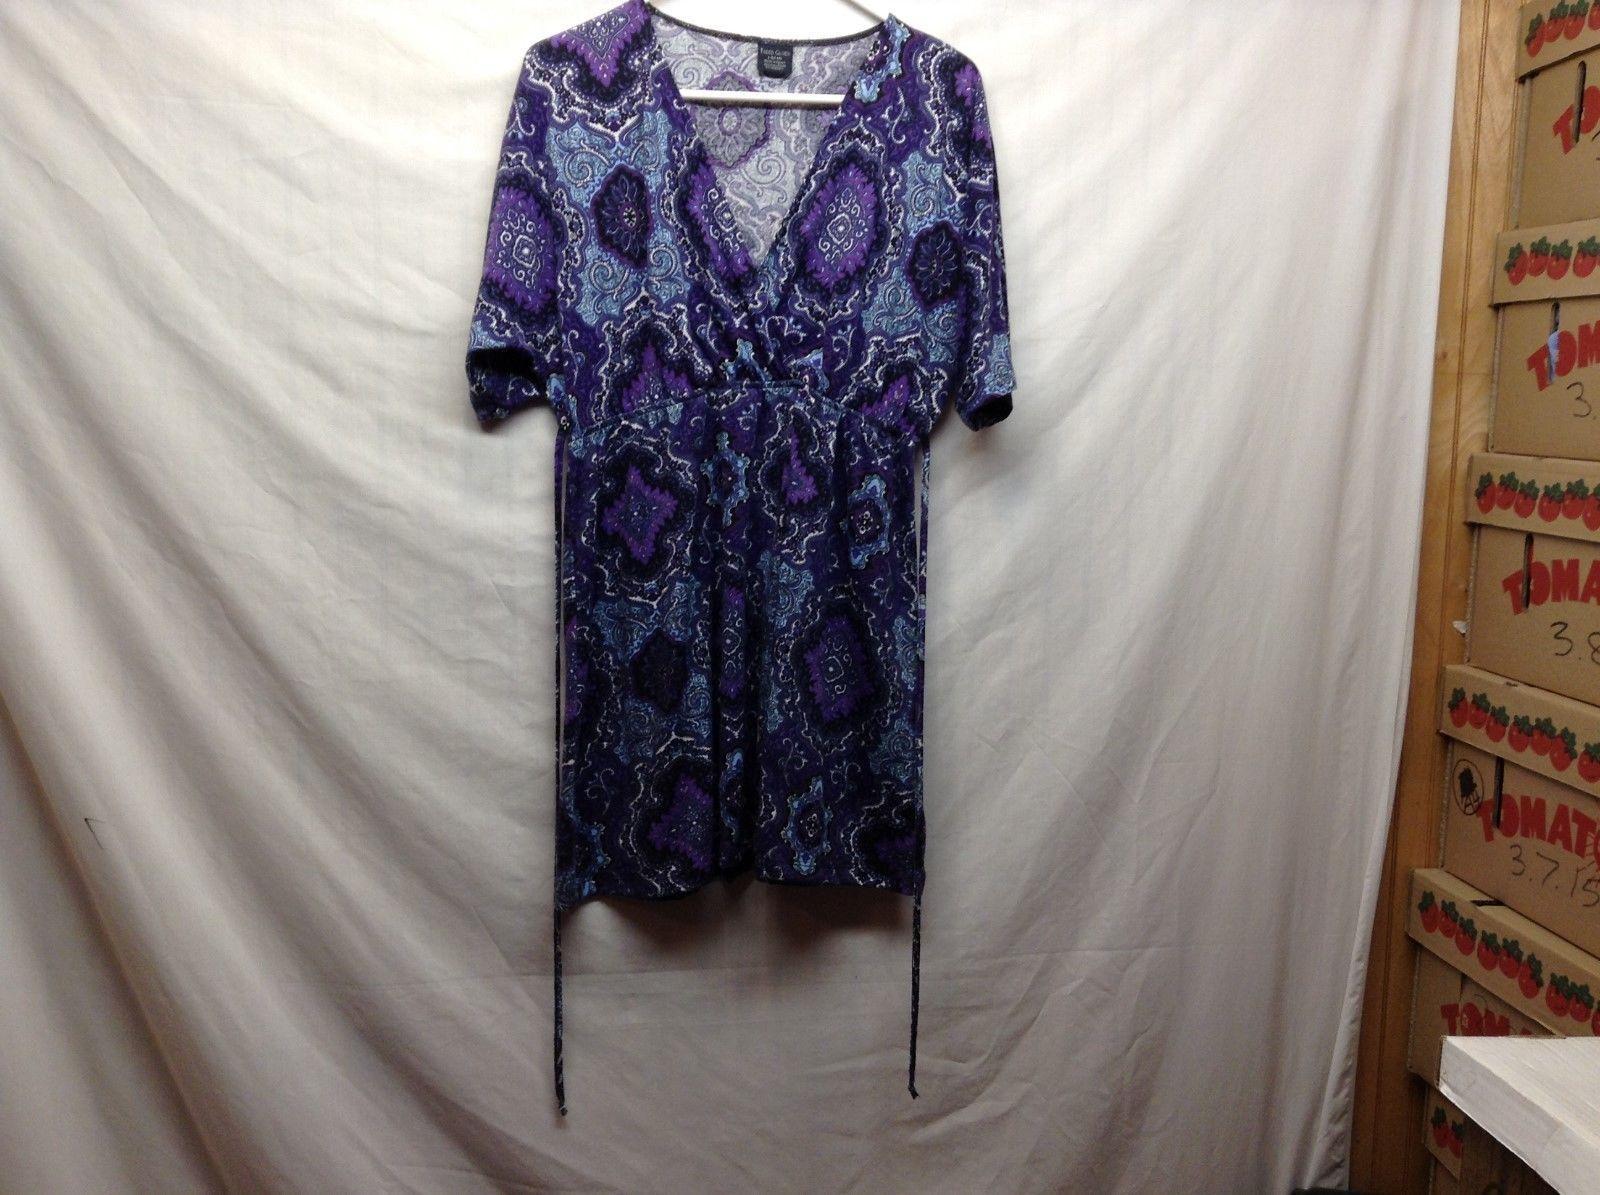 Faded Glory Purple V Neck Dress Sz LG 12-14